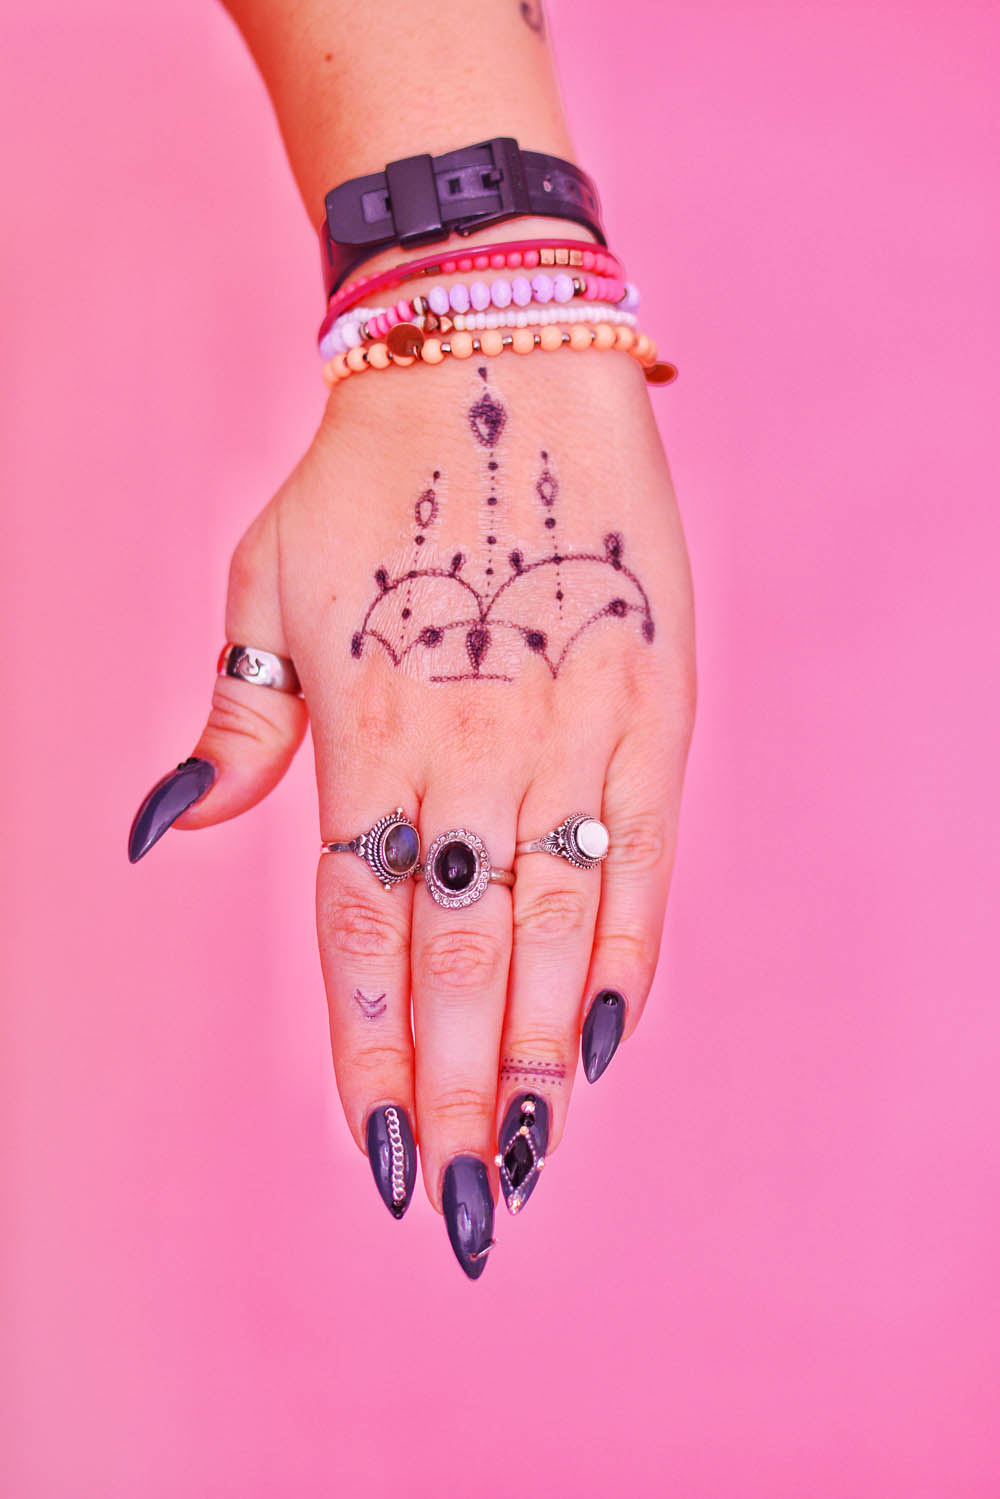 Free Printable Hand Tattoo Design & Tattoo Chat - Mermaid Gossip Blog - Free Printable Henna Tattoo Designs